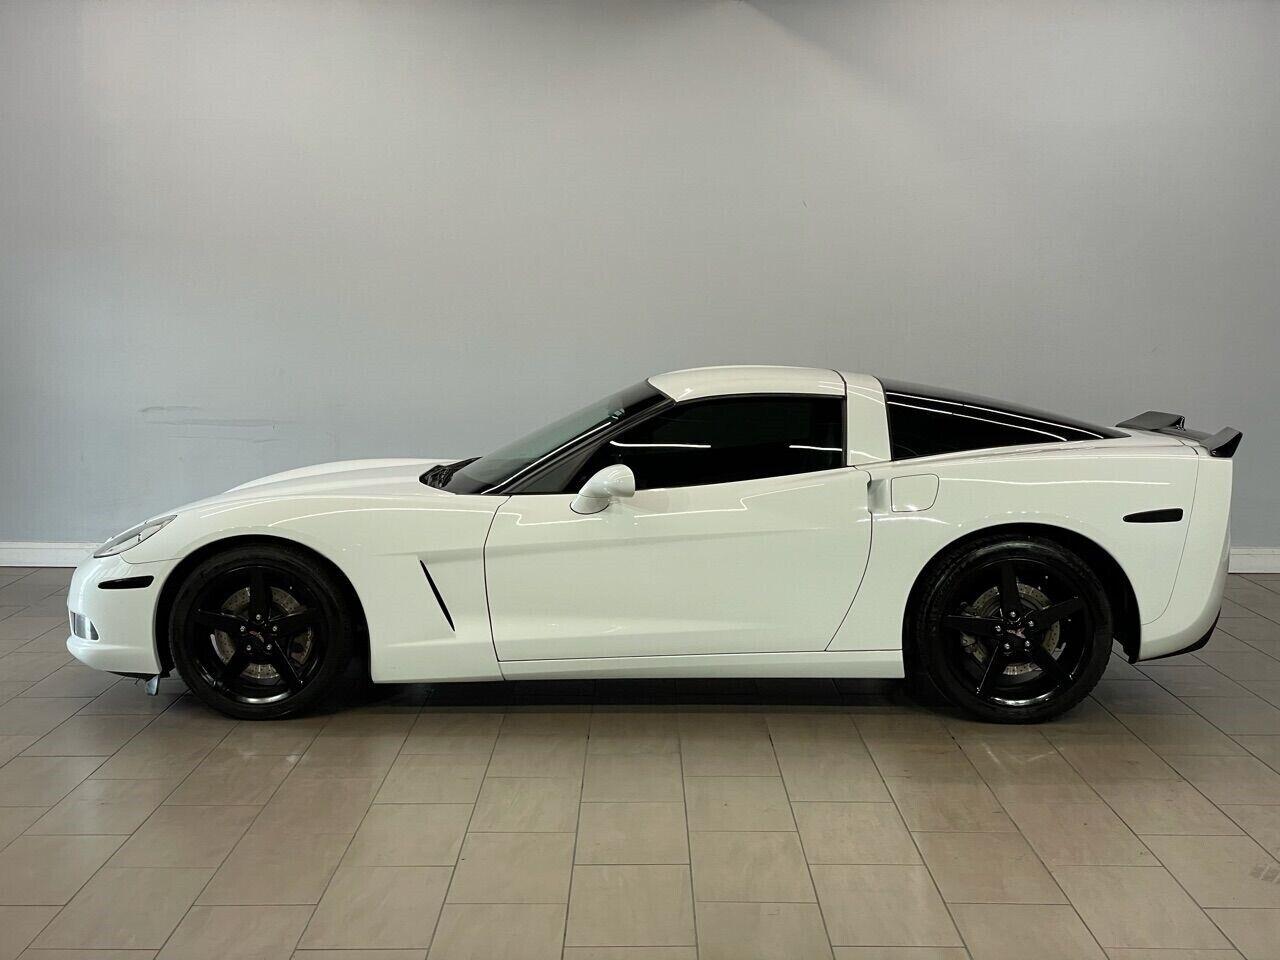 2007 White Chevrolet Corvette Coupe  | C6 Corvette Photo 7